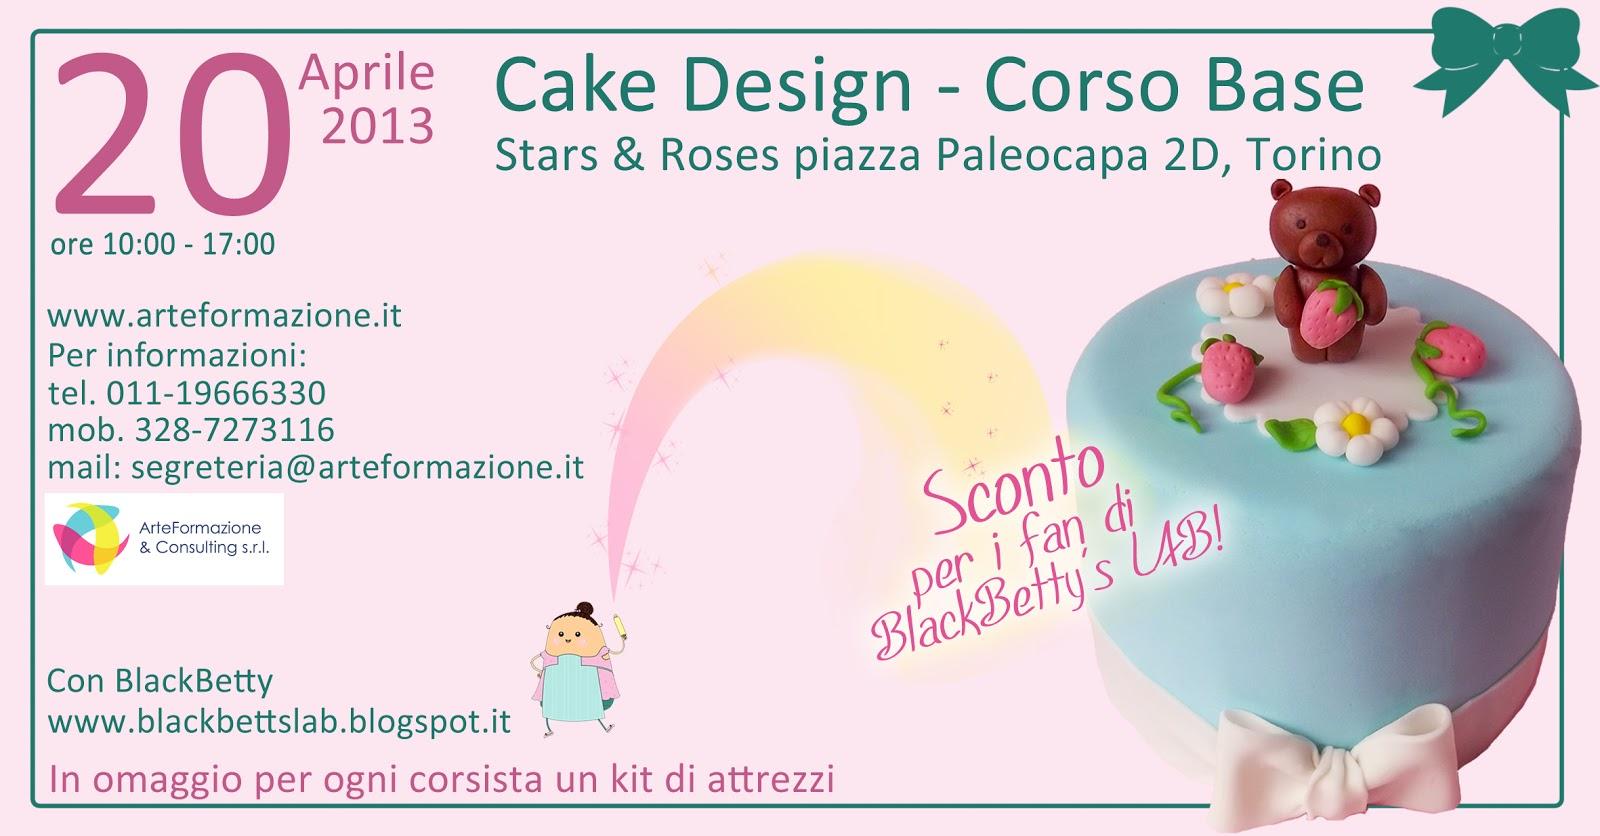 Va Be Cake Design Torino Orari : BlackBetty sLab: 1? Corso cake design - base a Torino